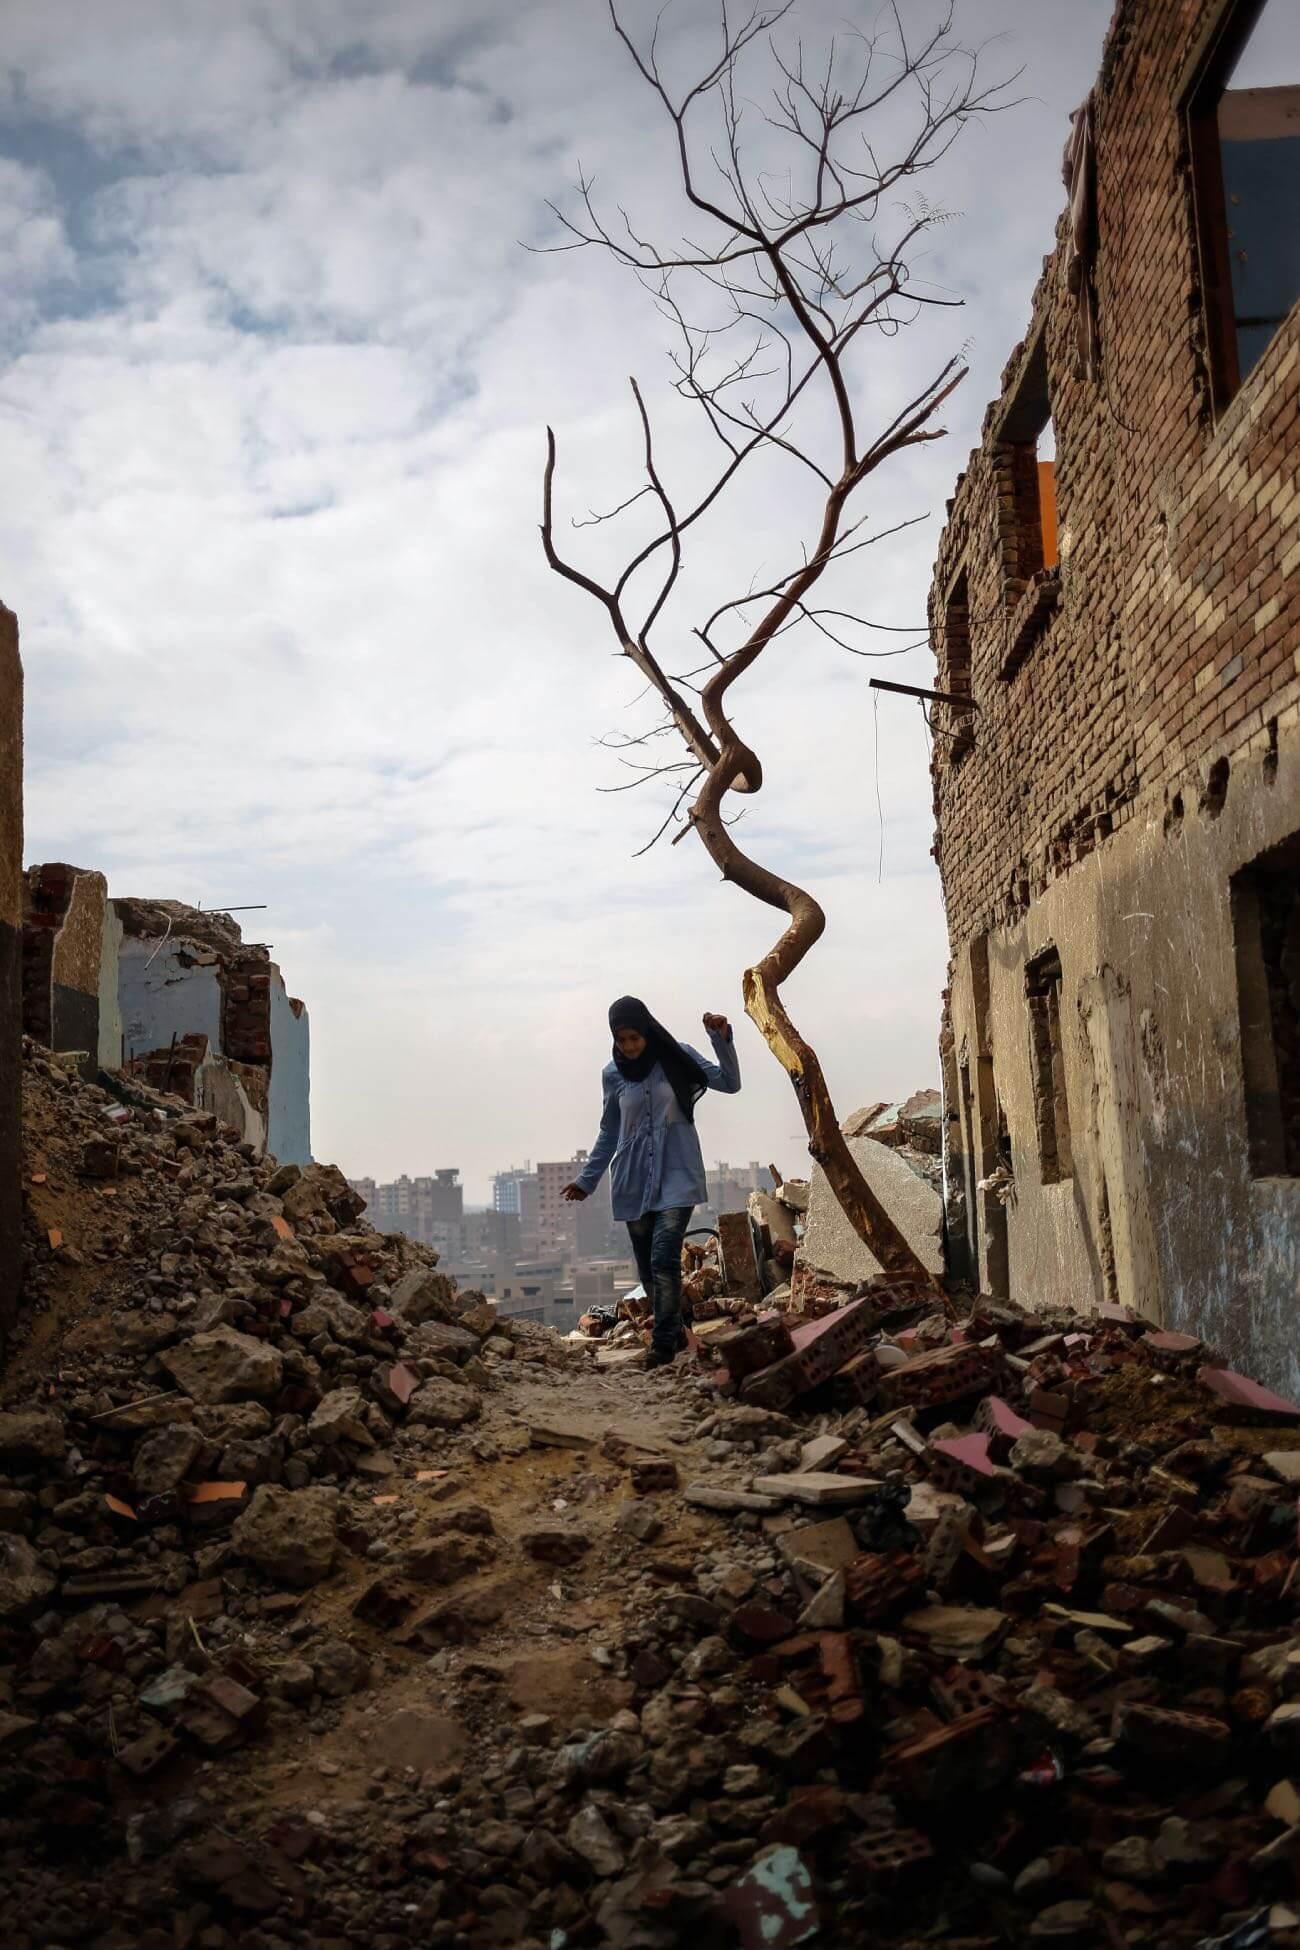 Yara picks her way through the rubble created by fallen-down buildings in Khairallah. Credit: Plan International / Heba Khalifa